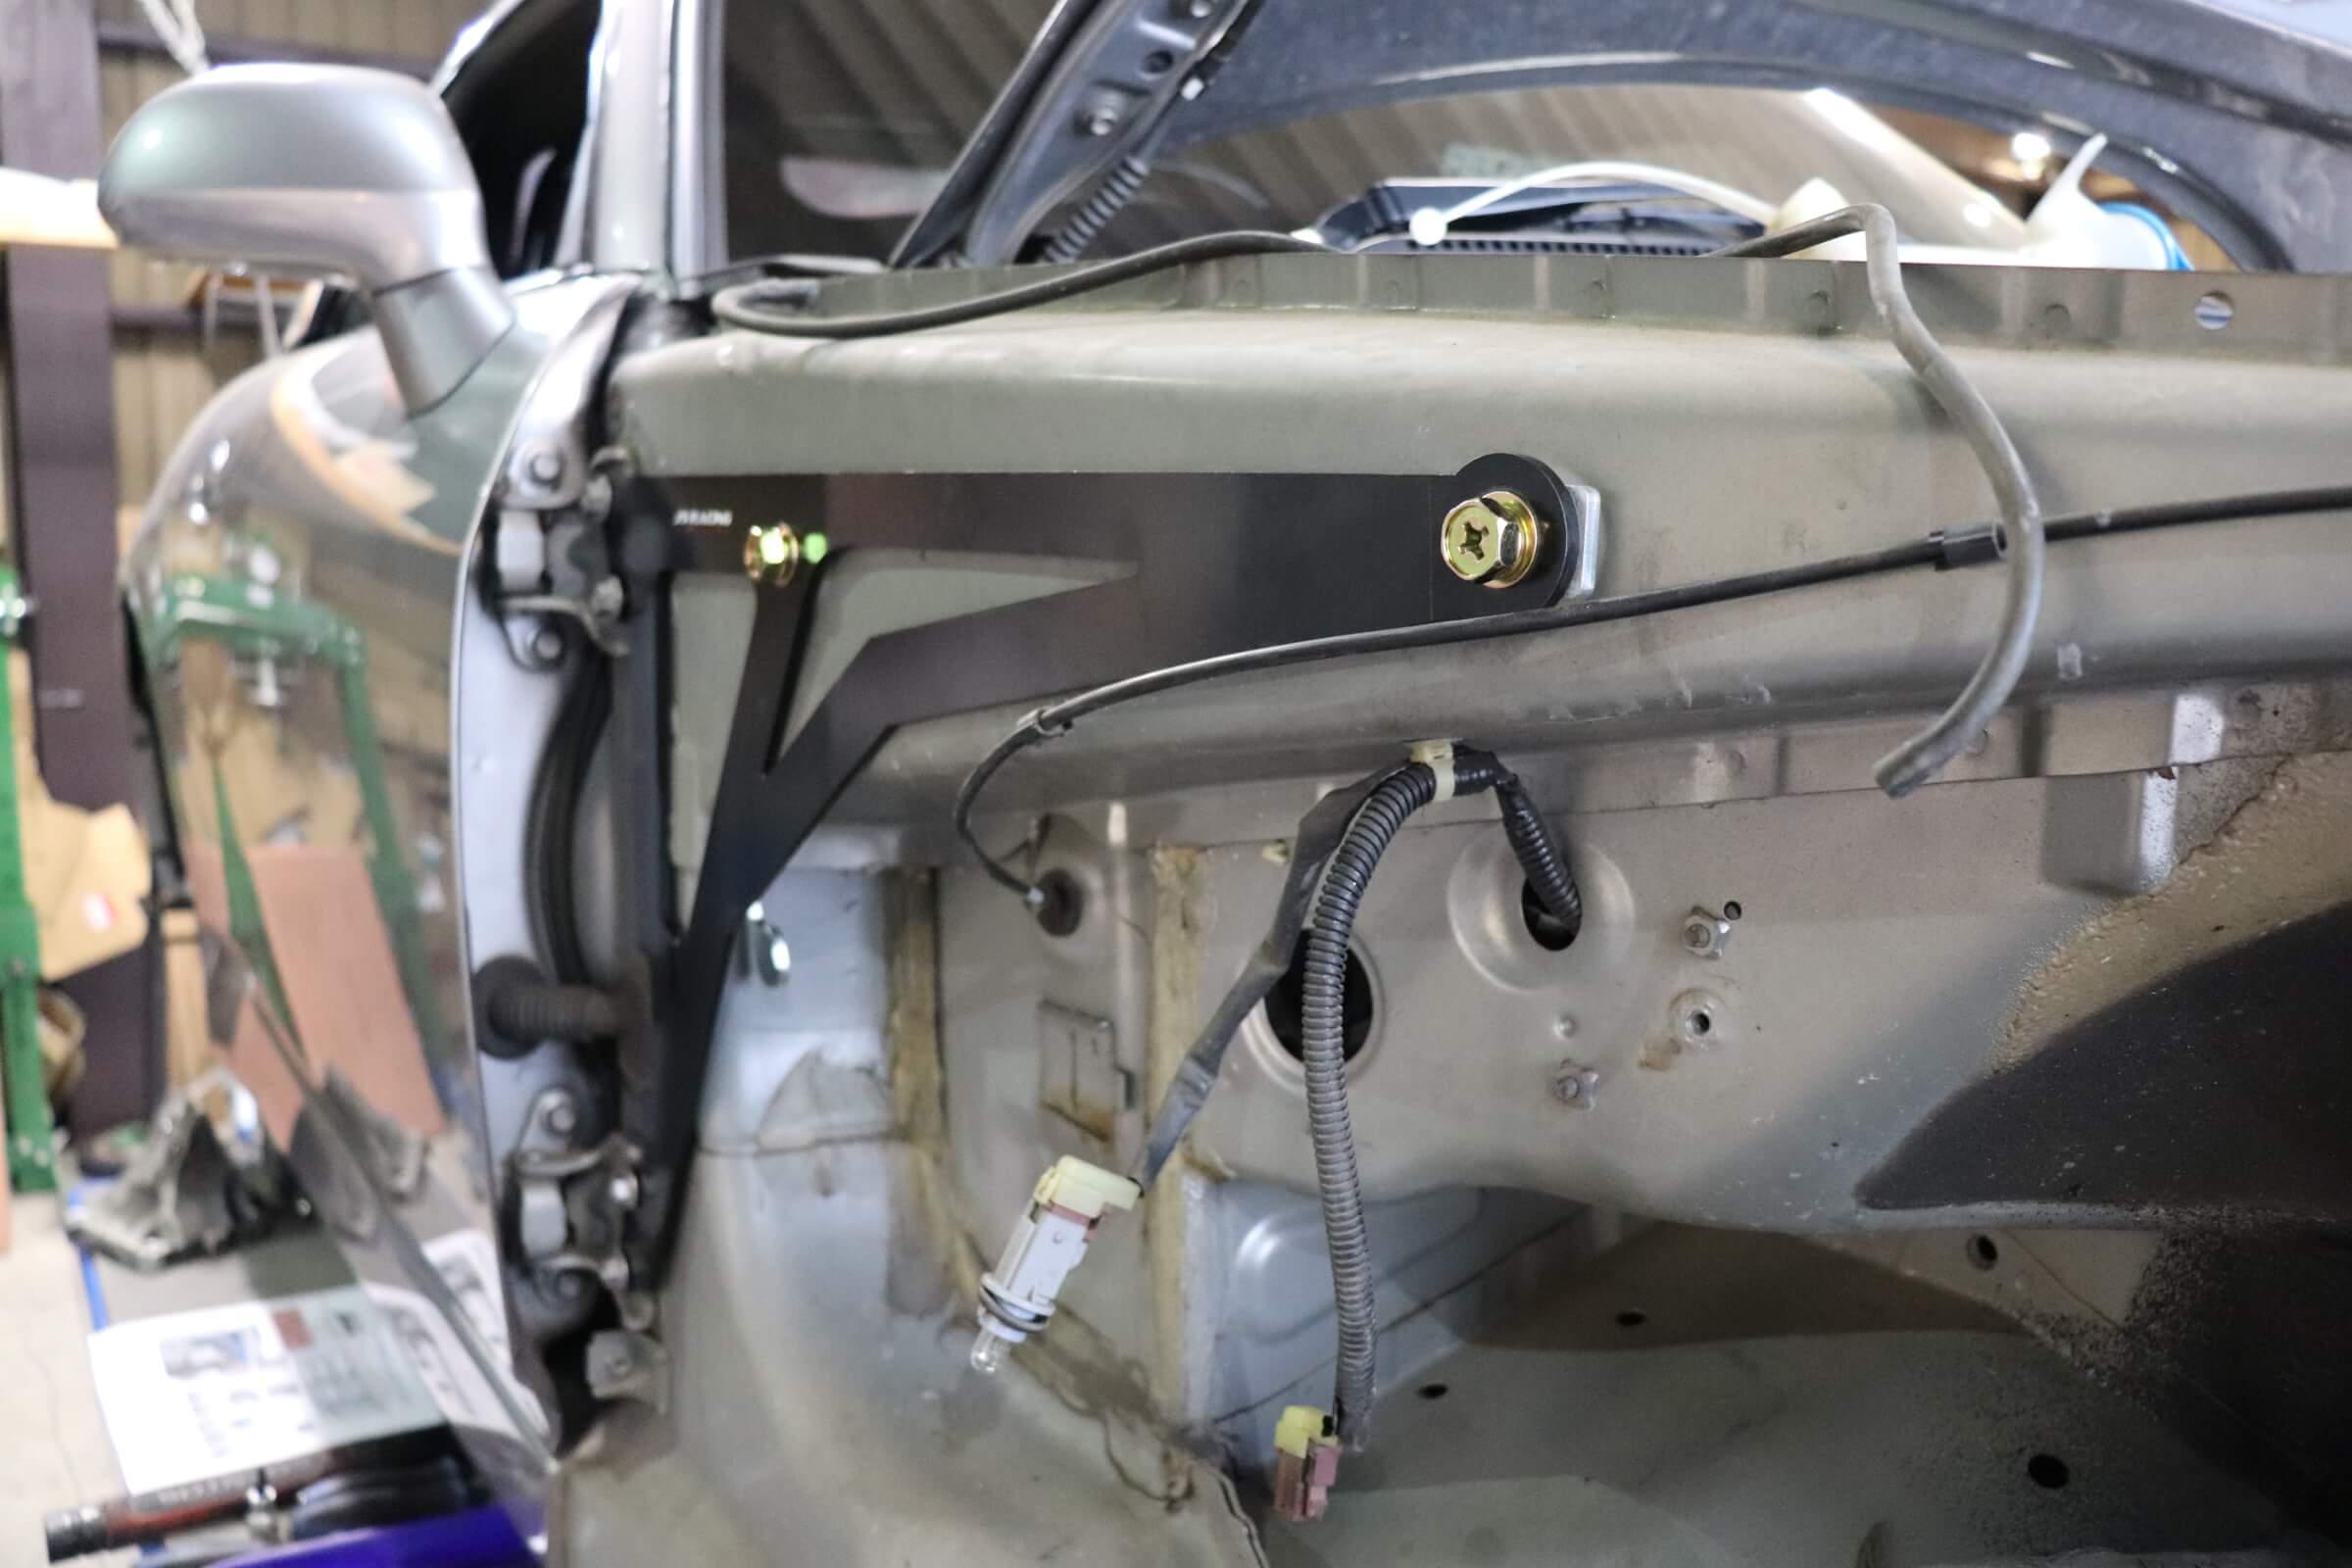 S2000 J'sracingサイドインナーブレース取り付け画像